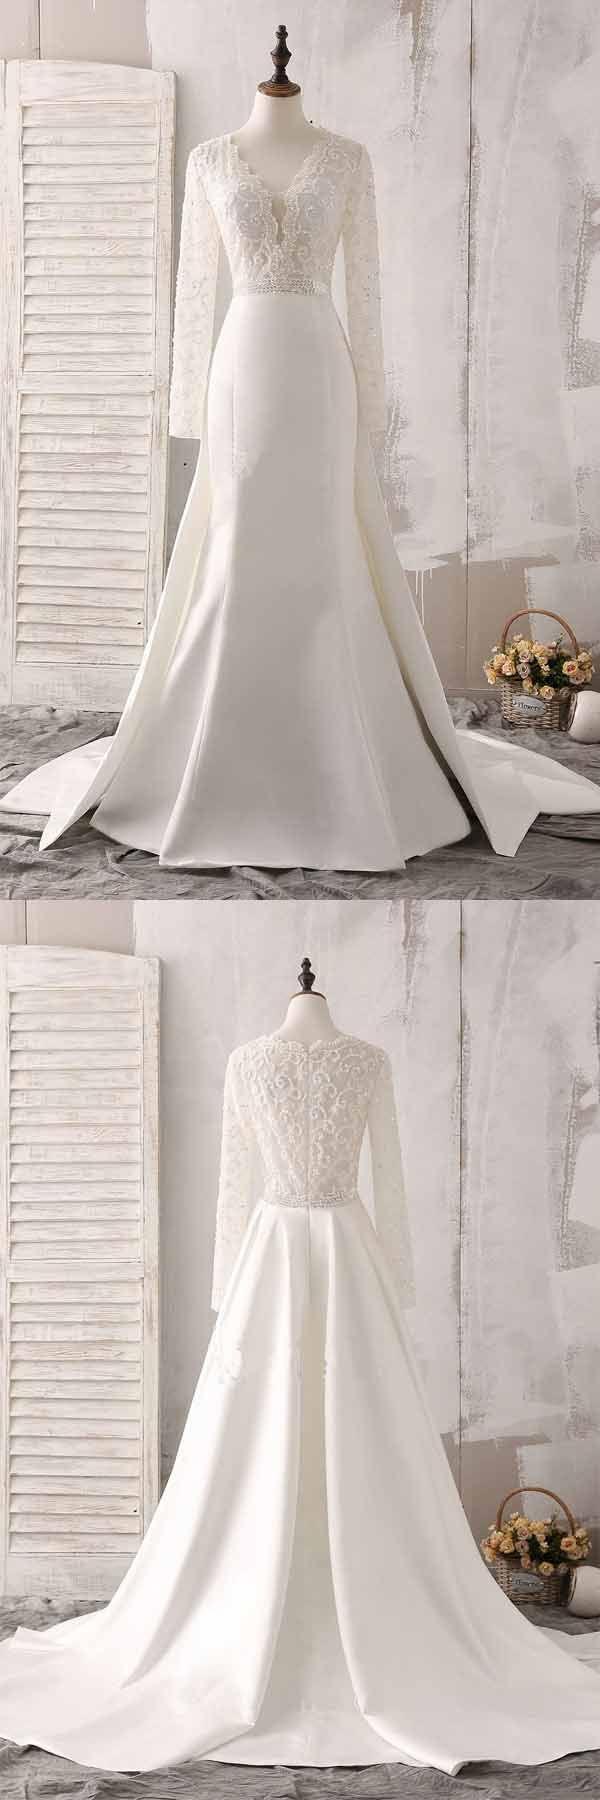 Ivory lace and satin vneck long sleeve beaded wedding dress wd